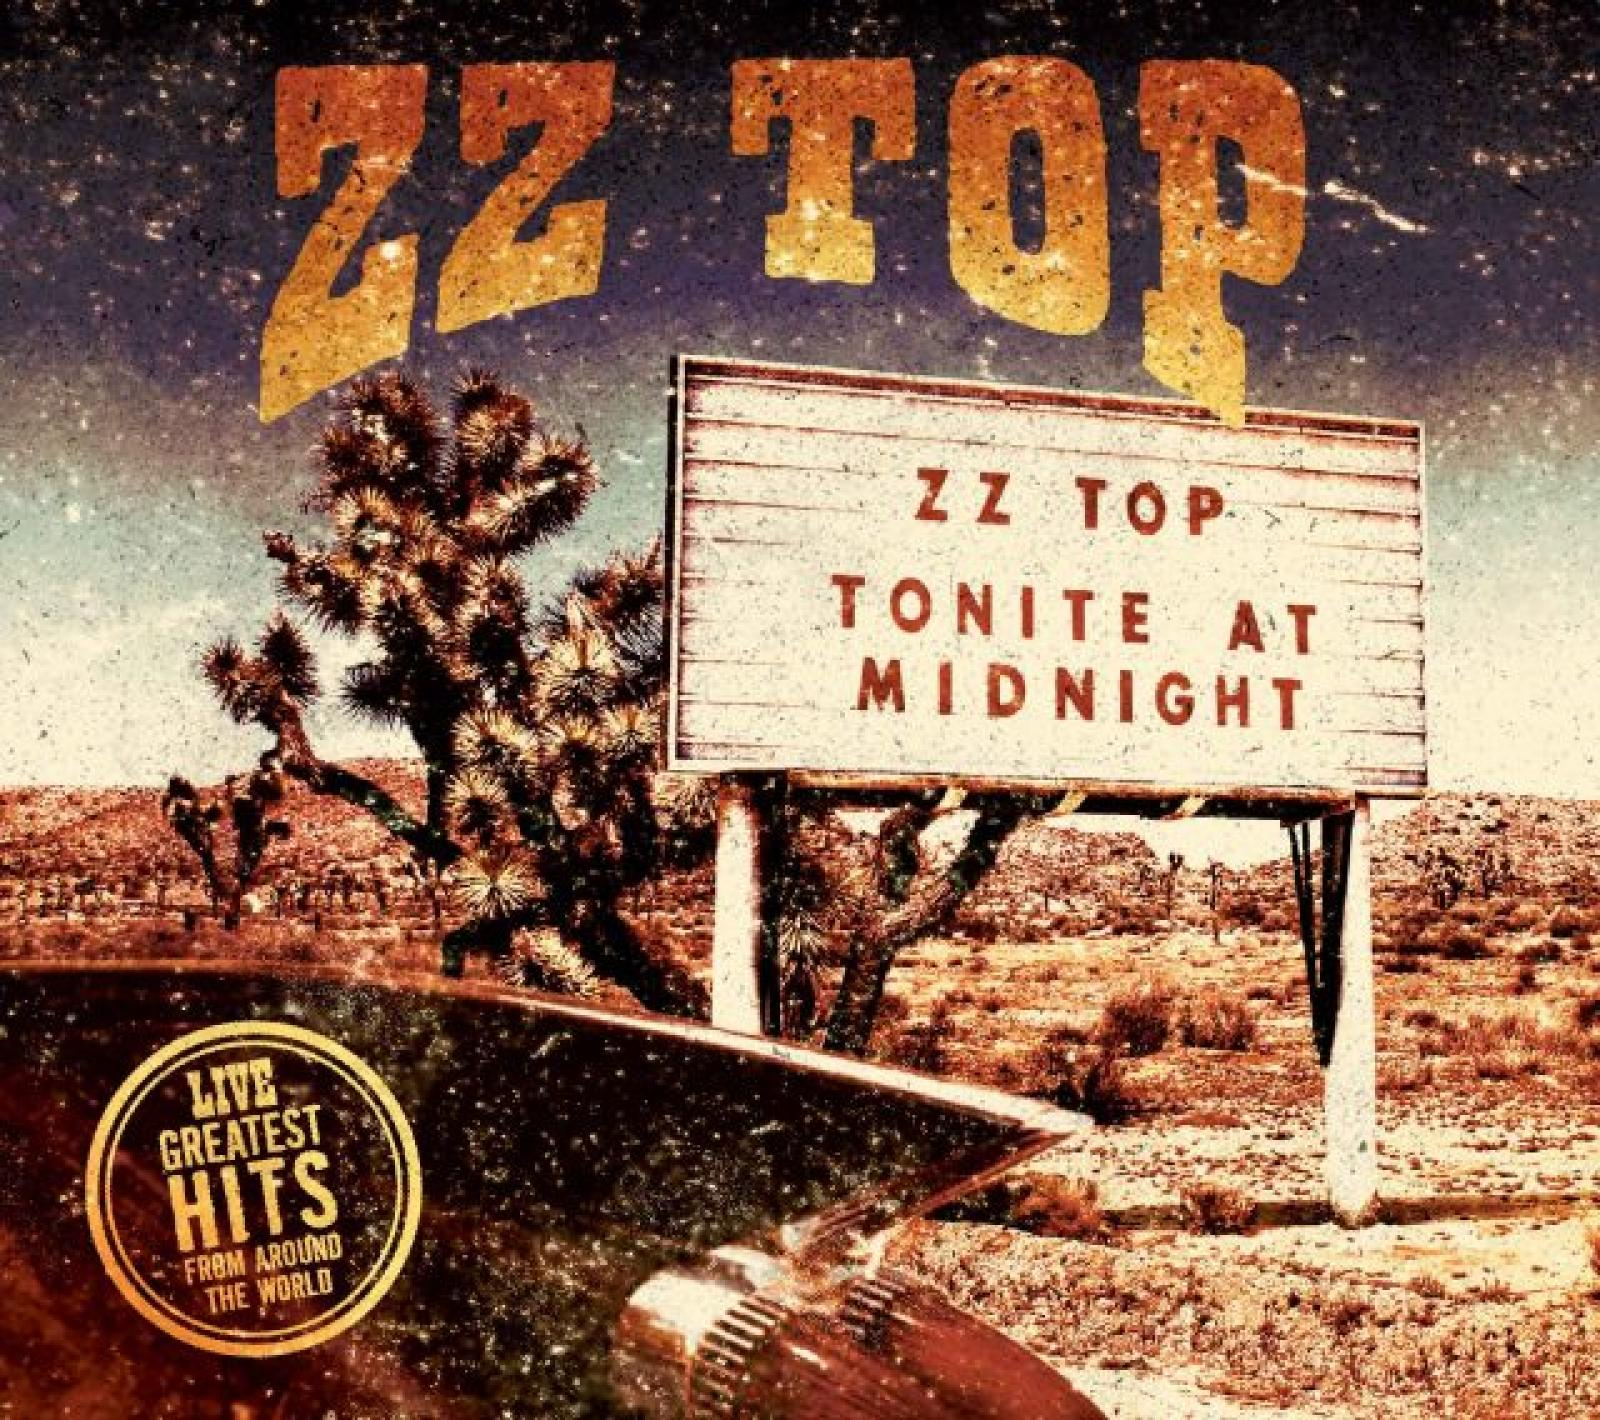 zz-top_cover_digipak-01_alt-640x568_0